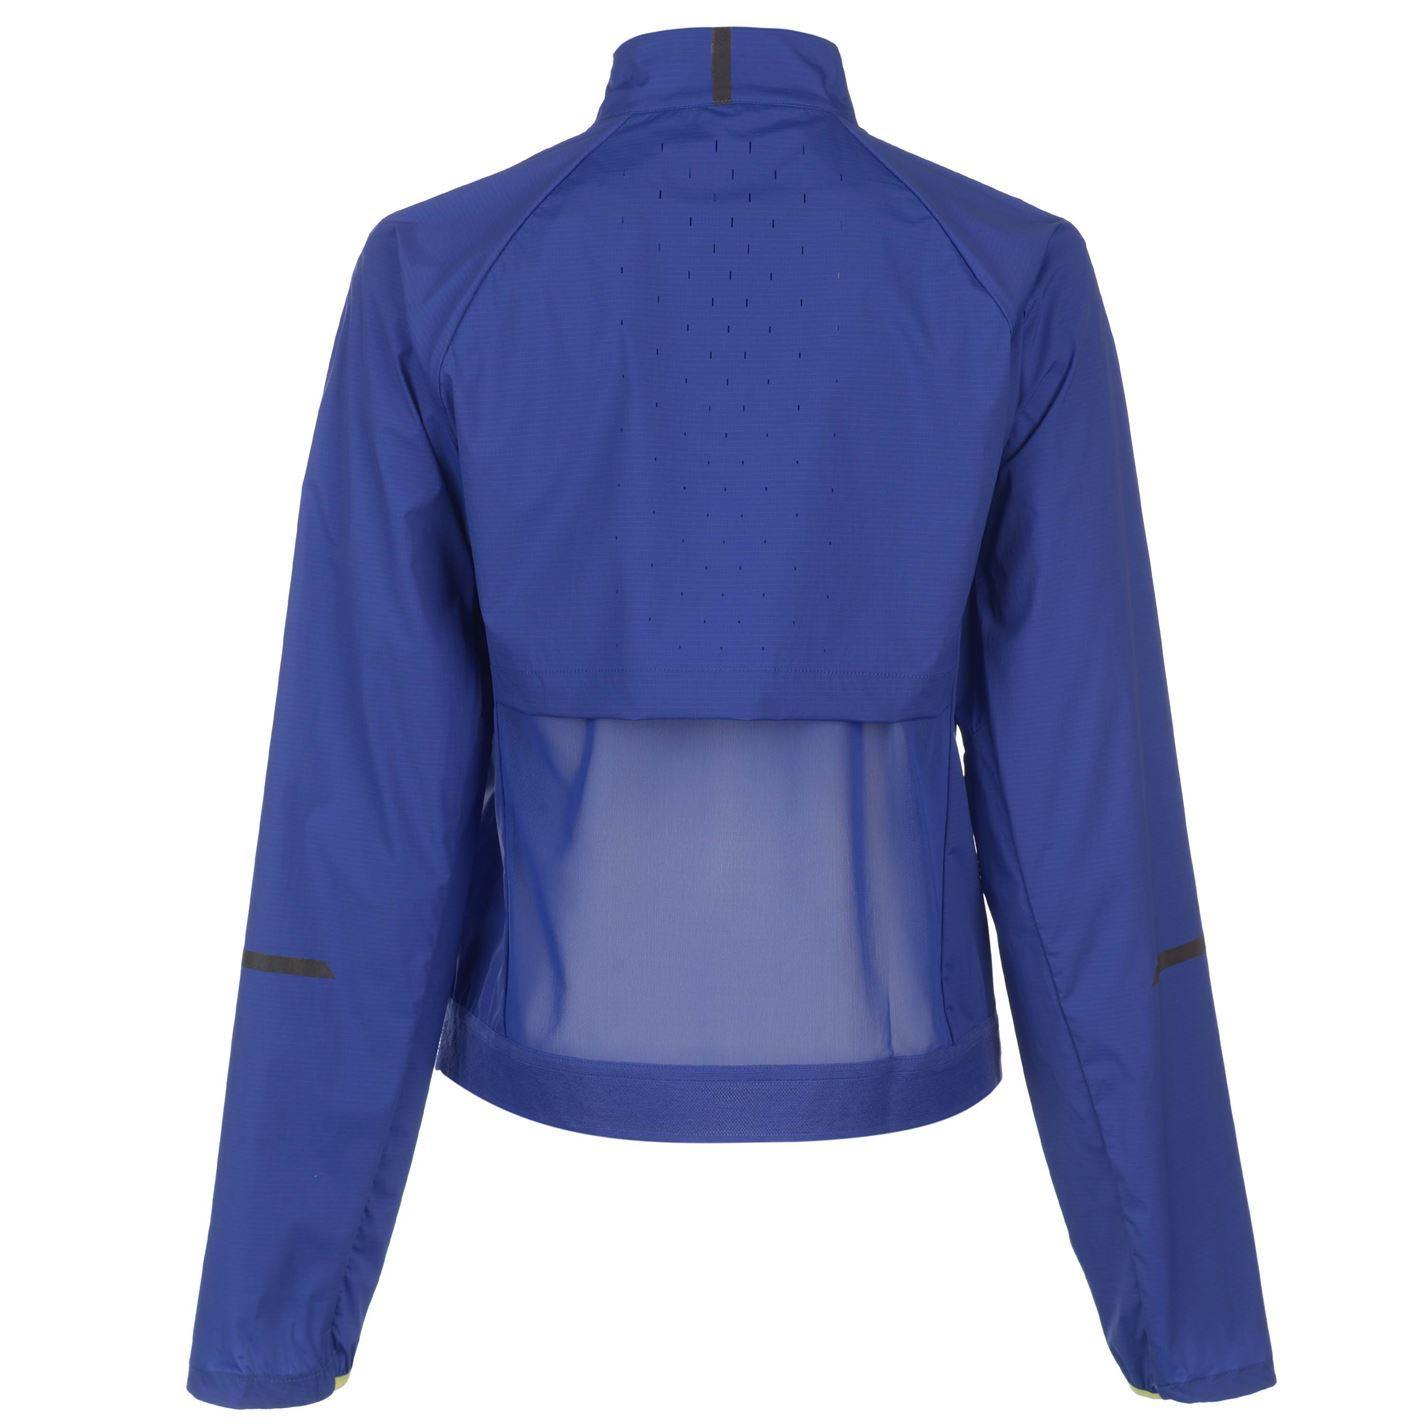 Damen Jogging Oberteil Laufjacke Präzision Blau Fitness Zu Details New Balance vbfm6IY7gy